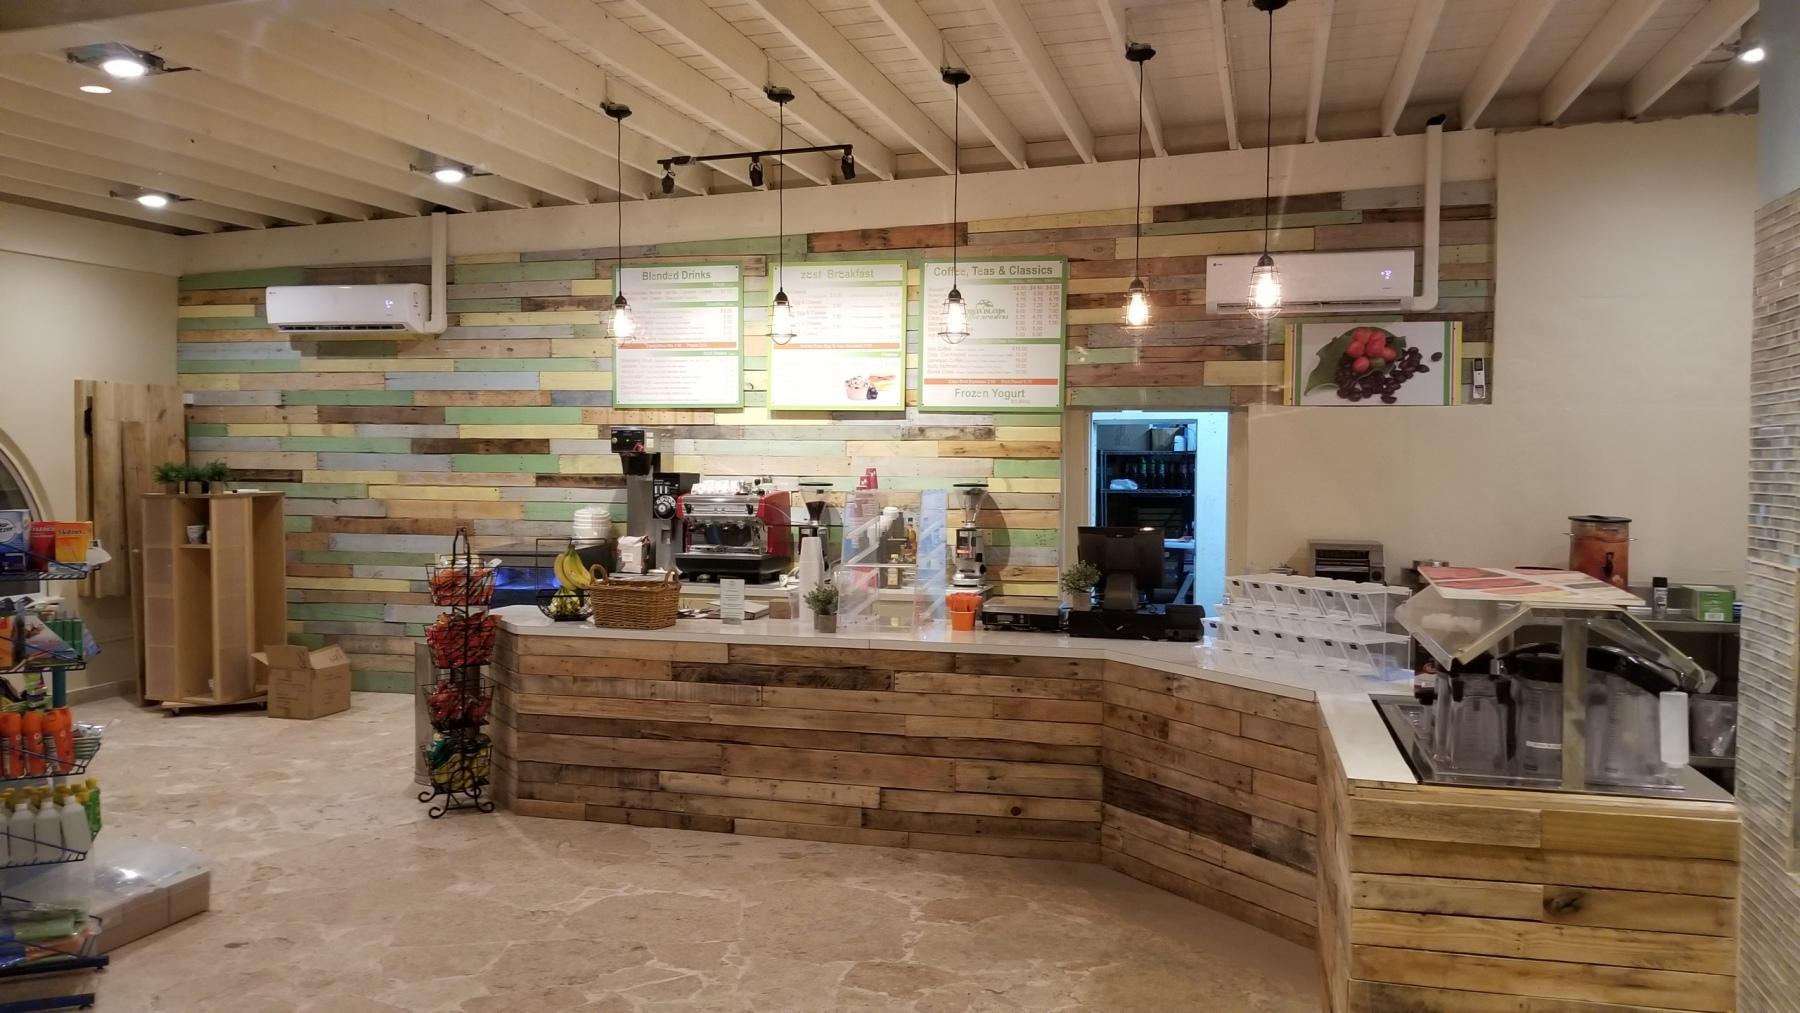 018 Coffee and Frozen Yogurt Shop